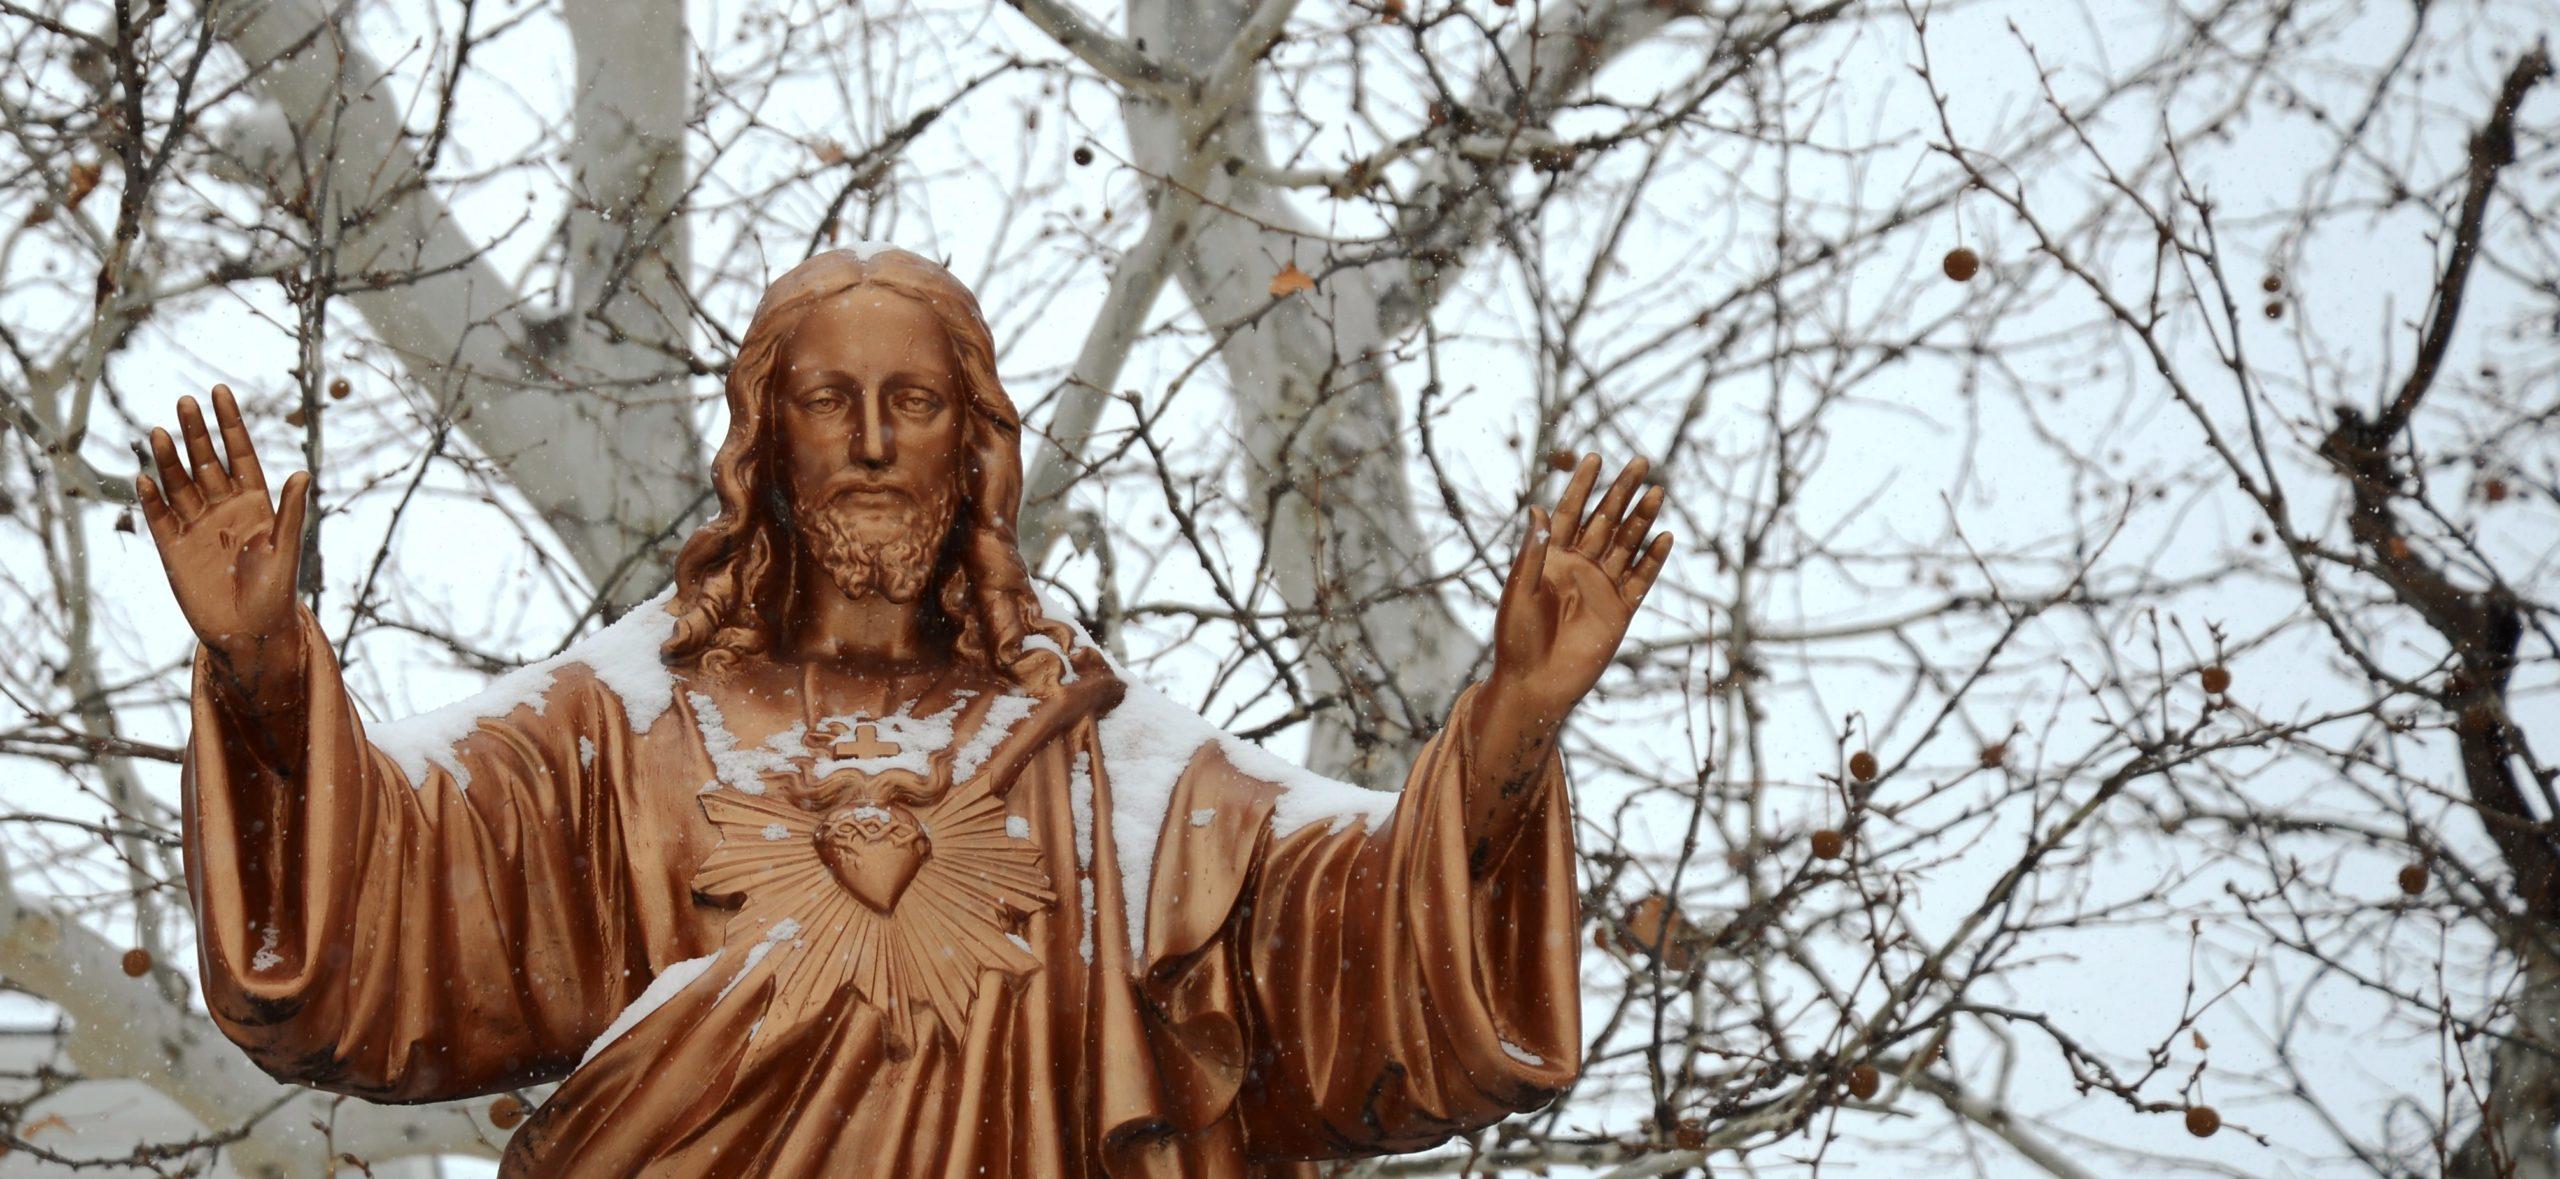 Jesus Statue in Snow